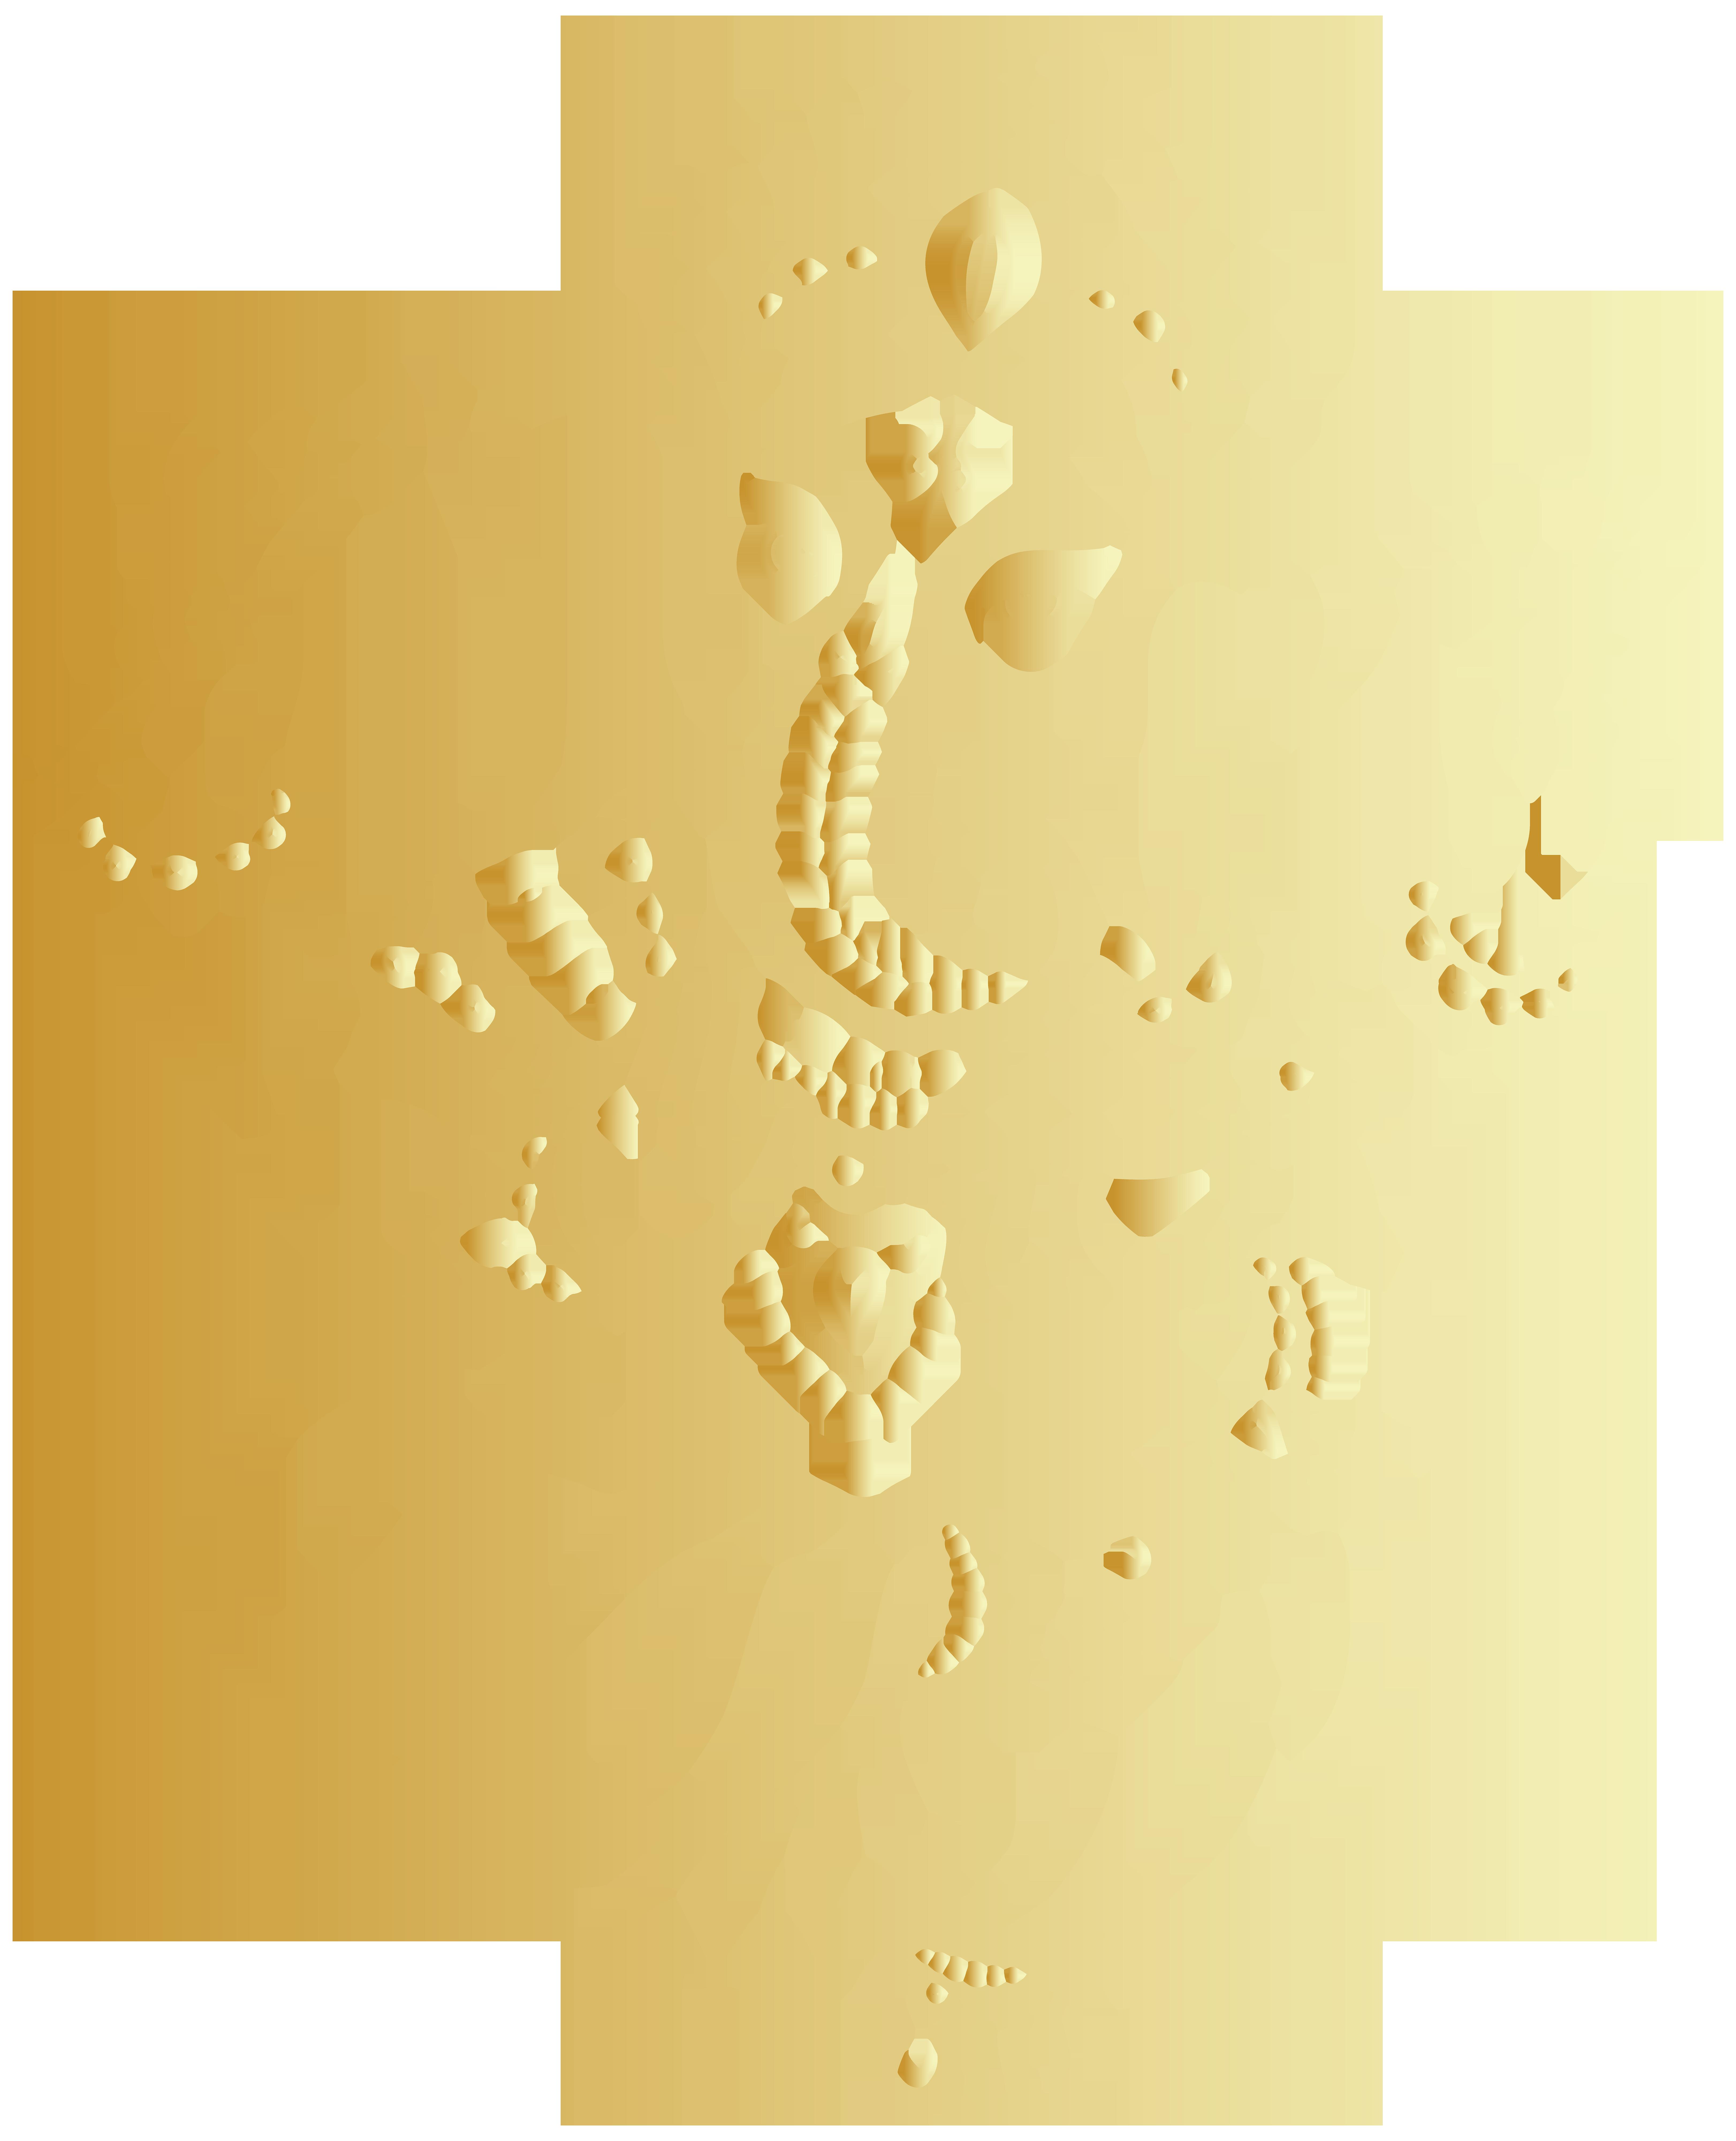 Ganpati clipart file picture free download Pin by koushik on gods in 2019 | Ganesha, Ganesh images, Ganesha art picture free download